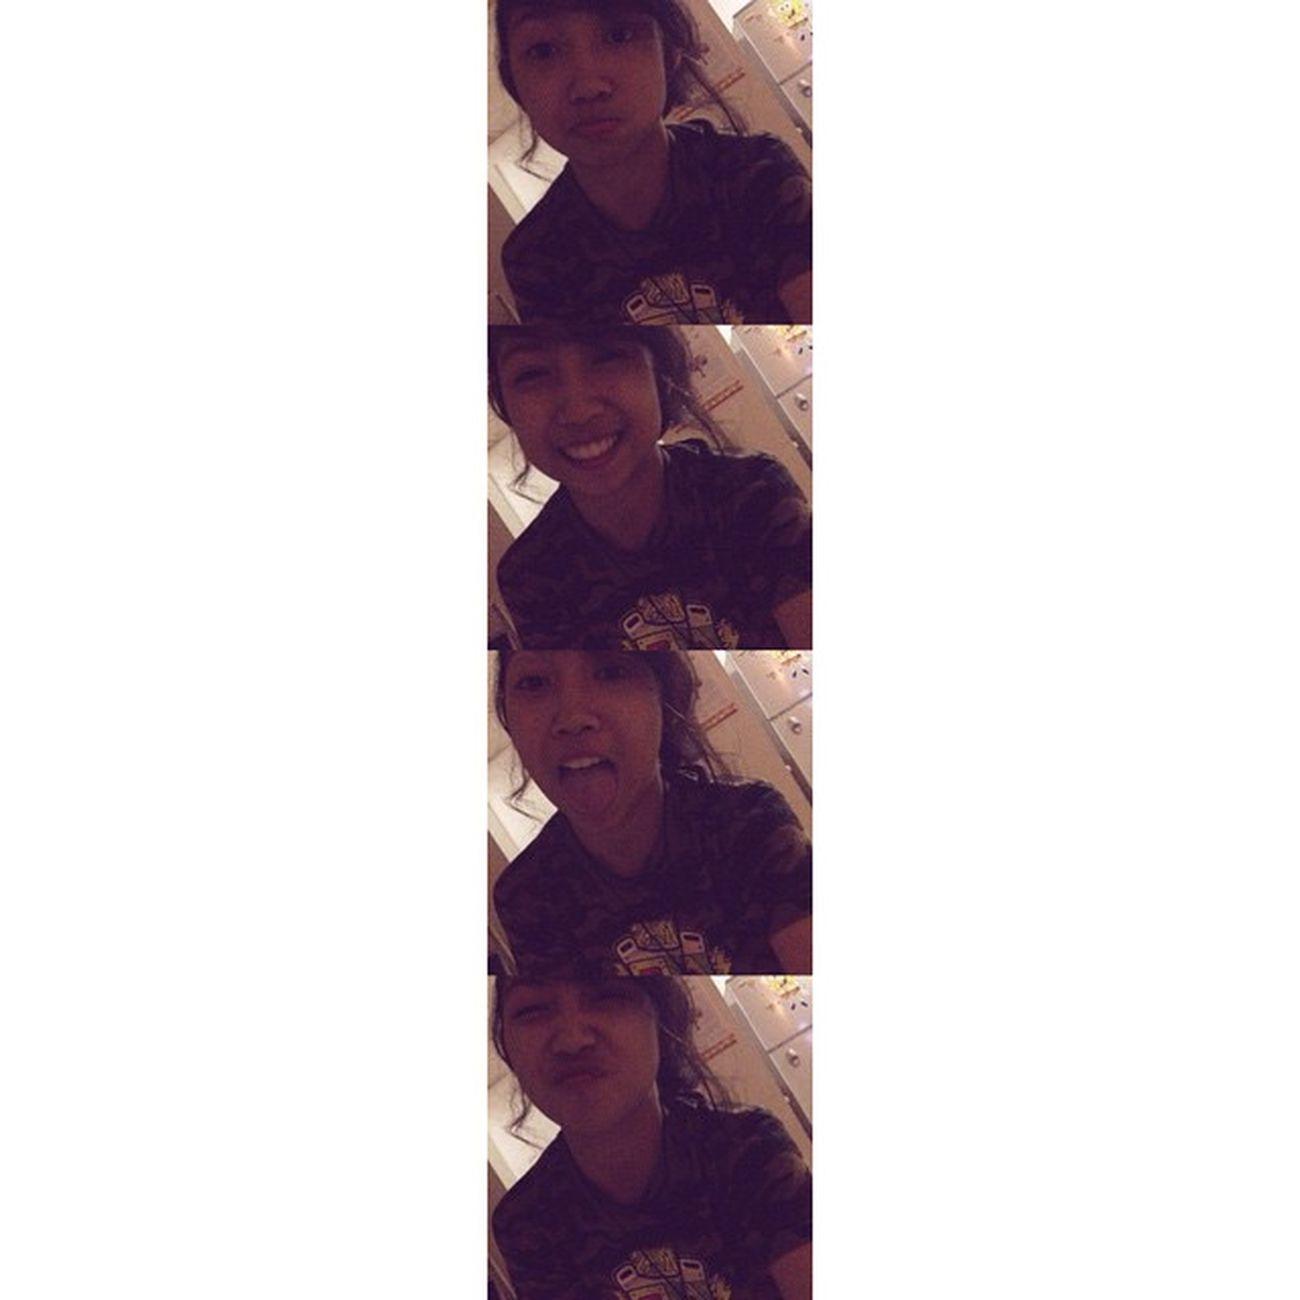 BlahBlah 😝😝 Selfieee MimingXD Like4like Follow4follow